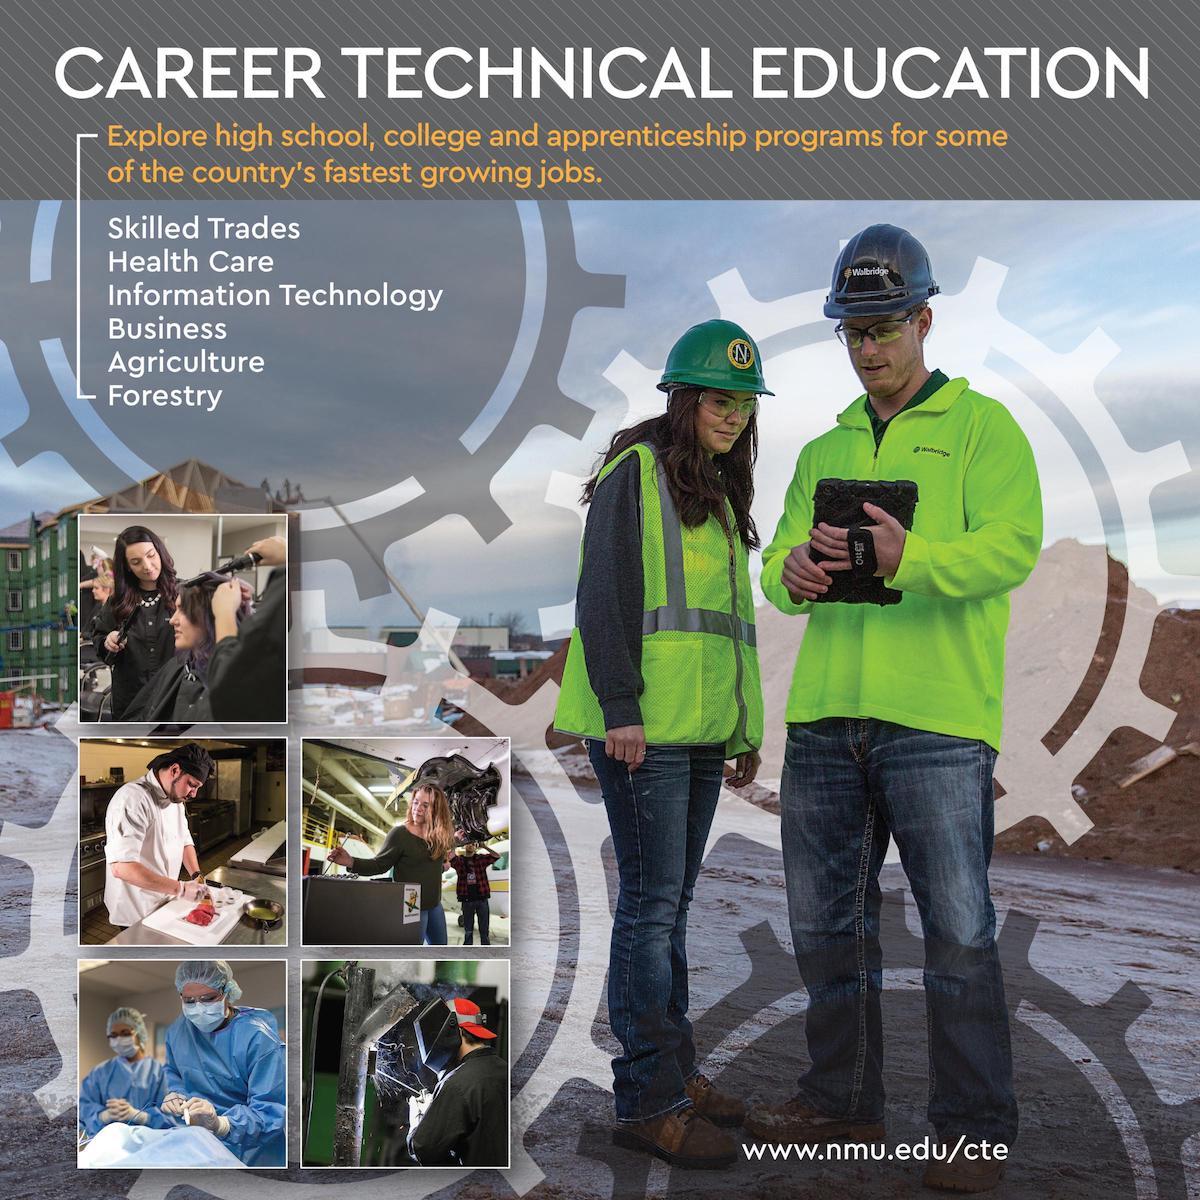 career technical education northern michigan university career tech education